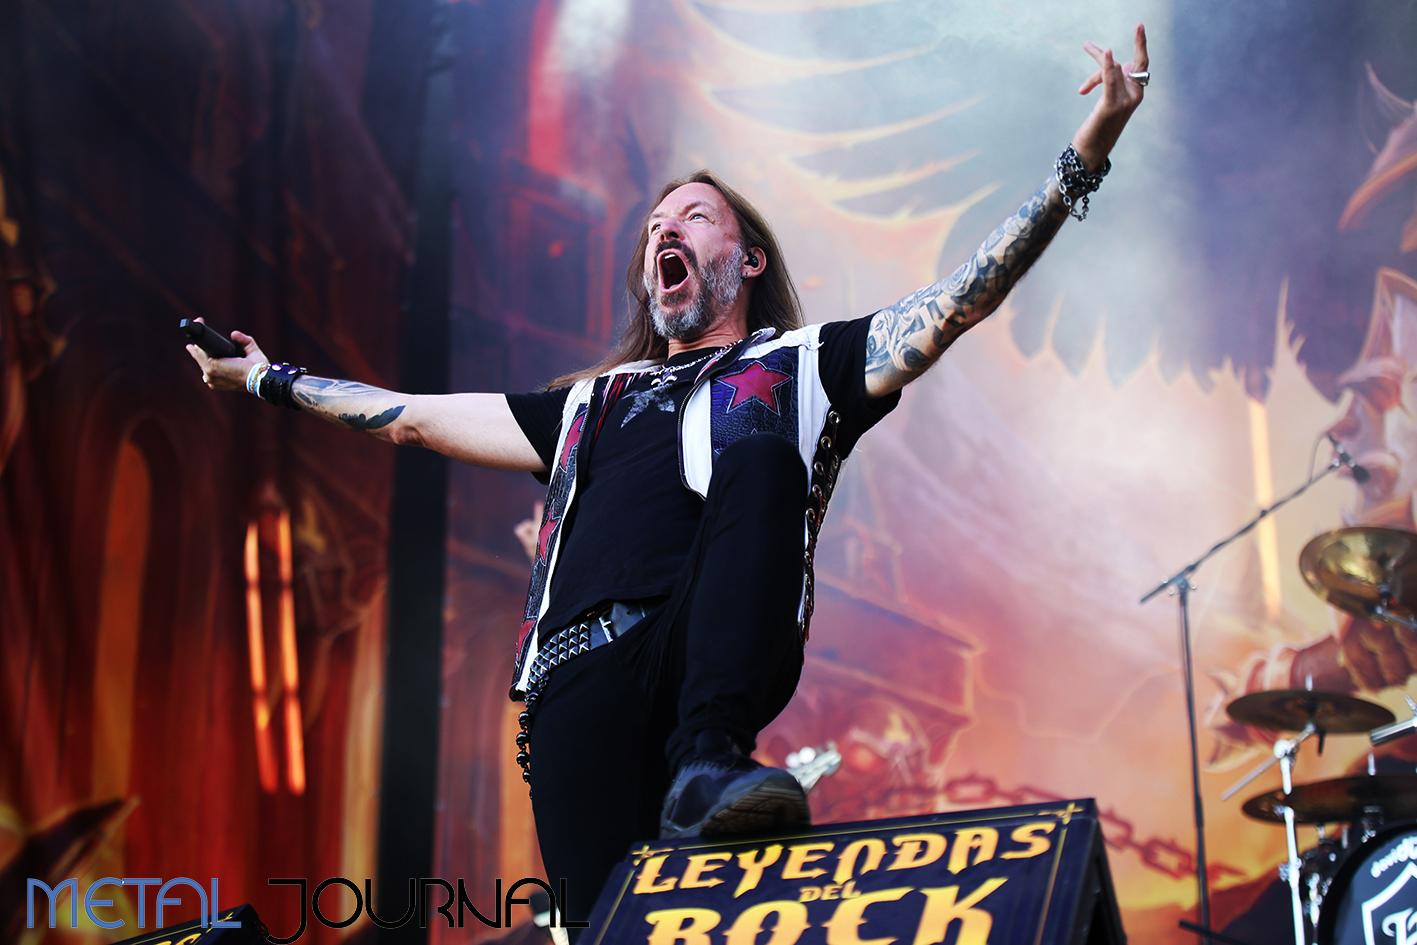 hammerfall - leyendas del rock 2019 metal journal pic 3